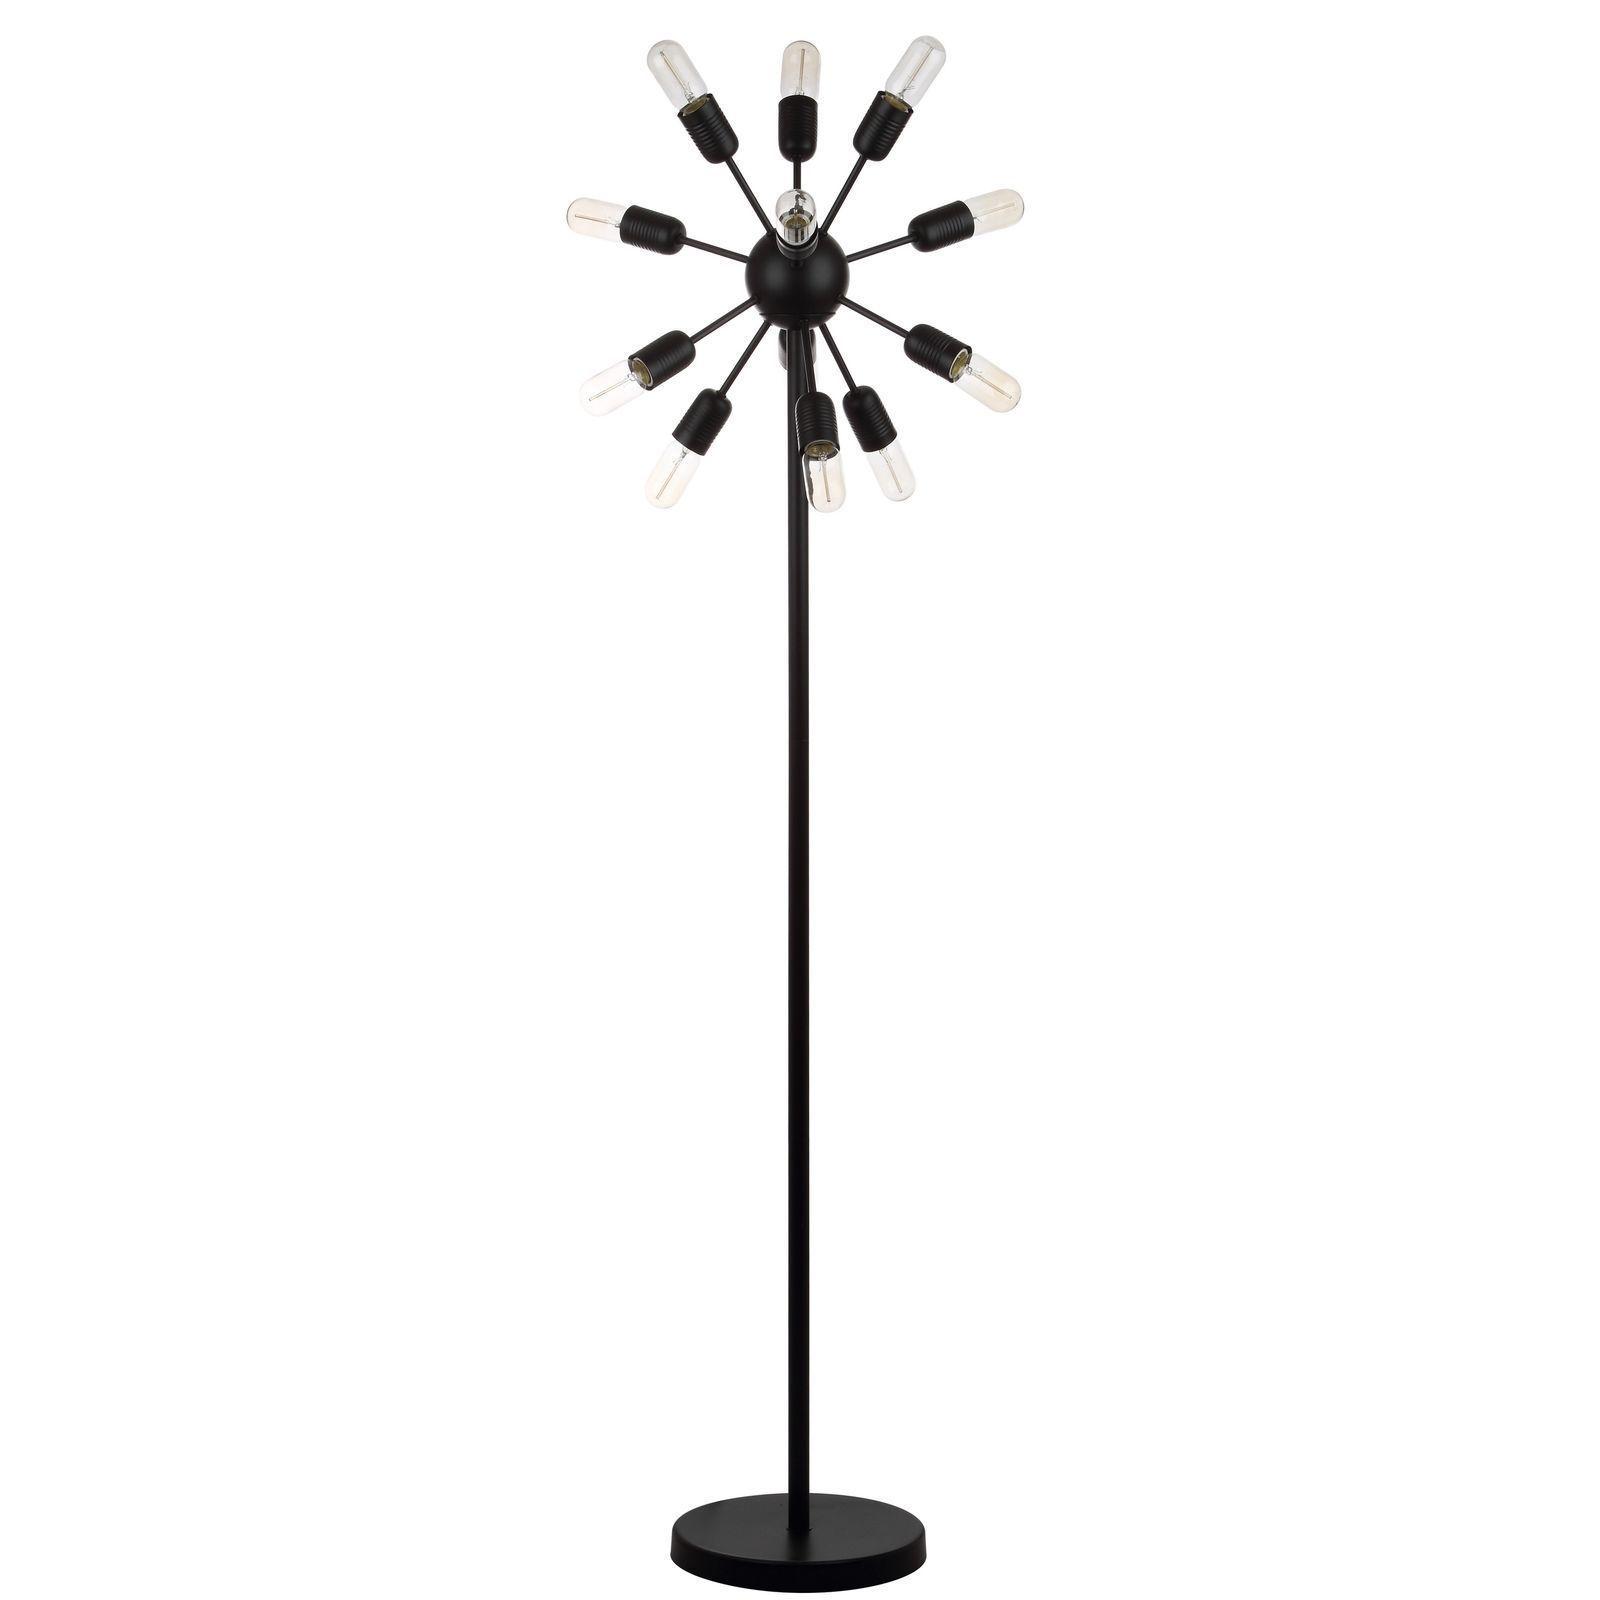 "Safavieh Lighting Urban 12-light Retro Edison Bulb Floor Lamp  67.5"""